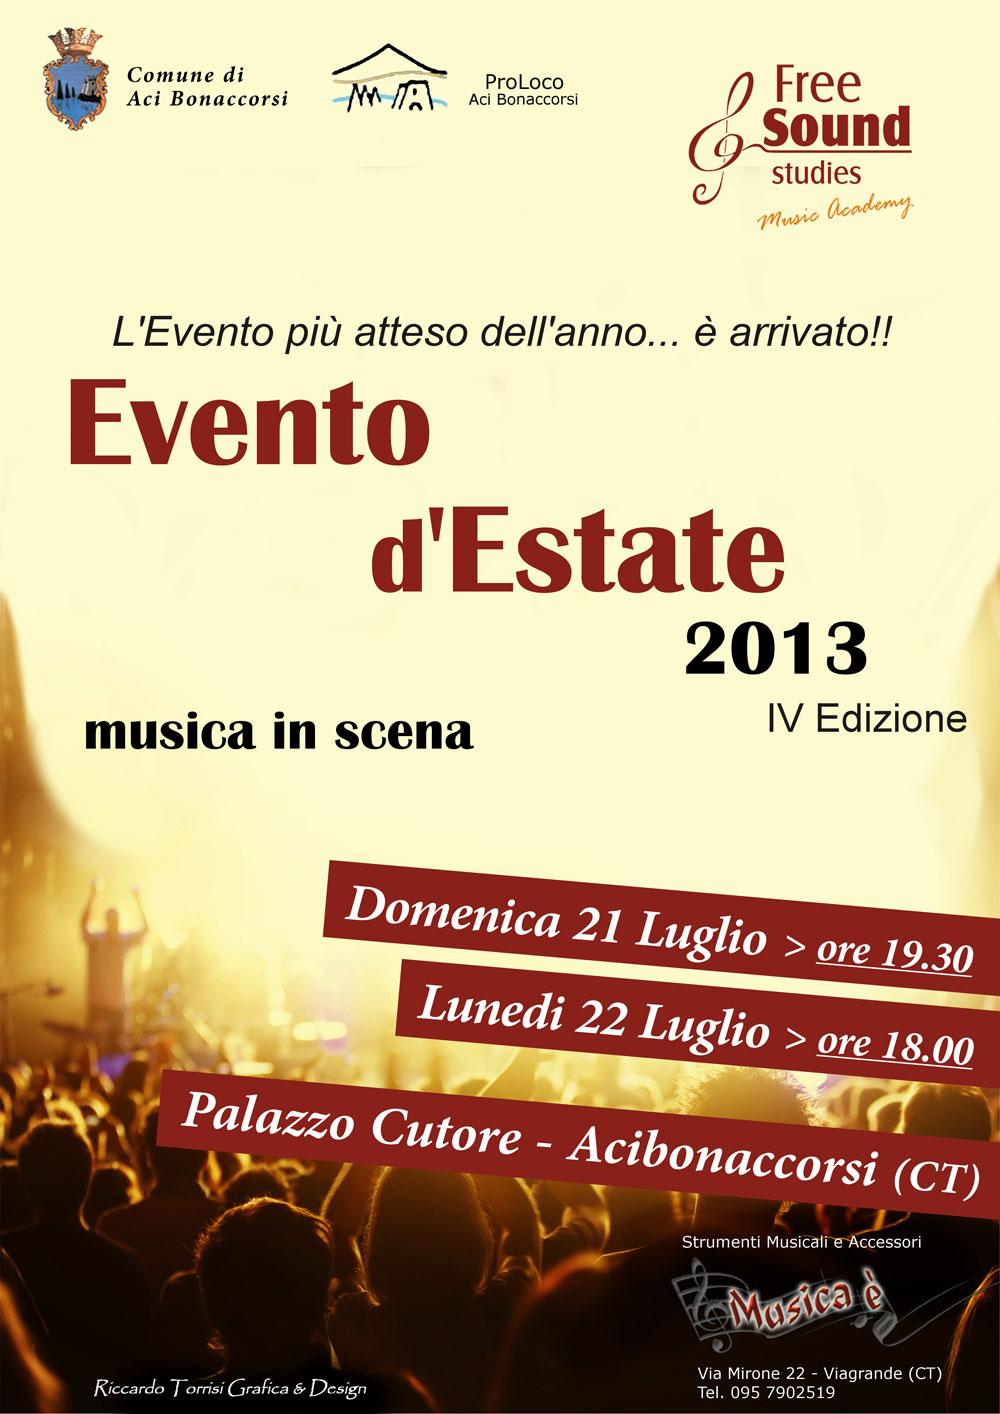 Evento-d'Estate-2013-Free-Sound-Studies